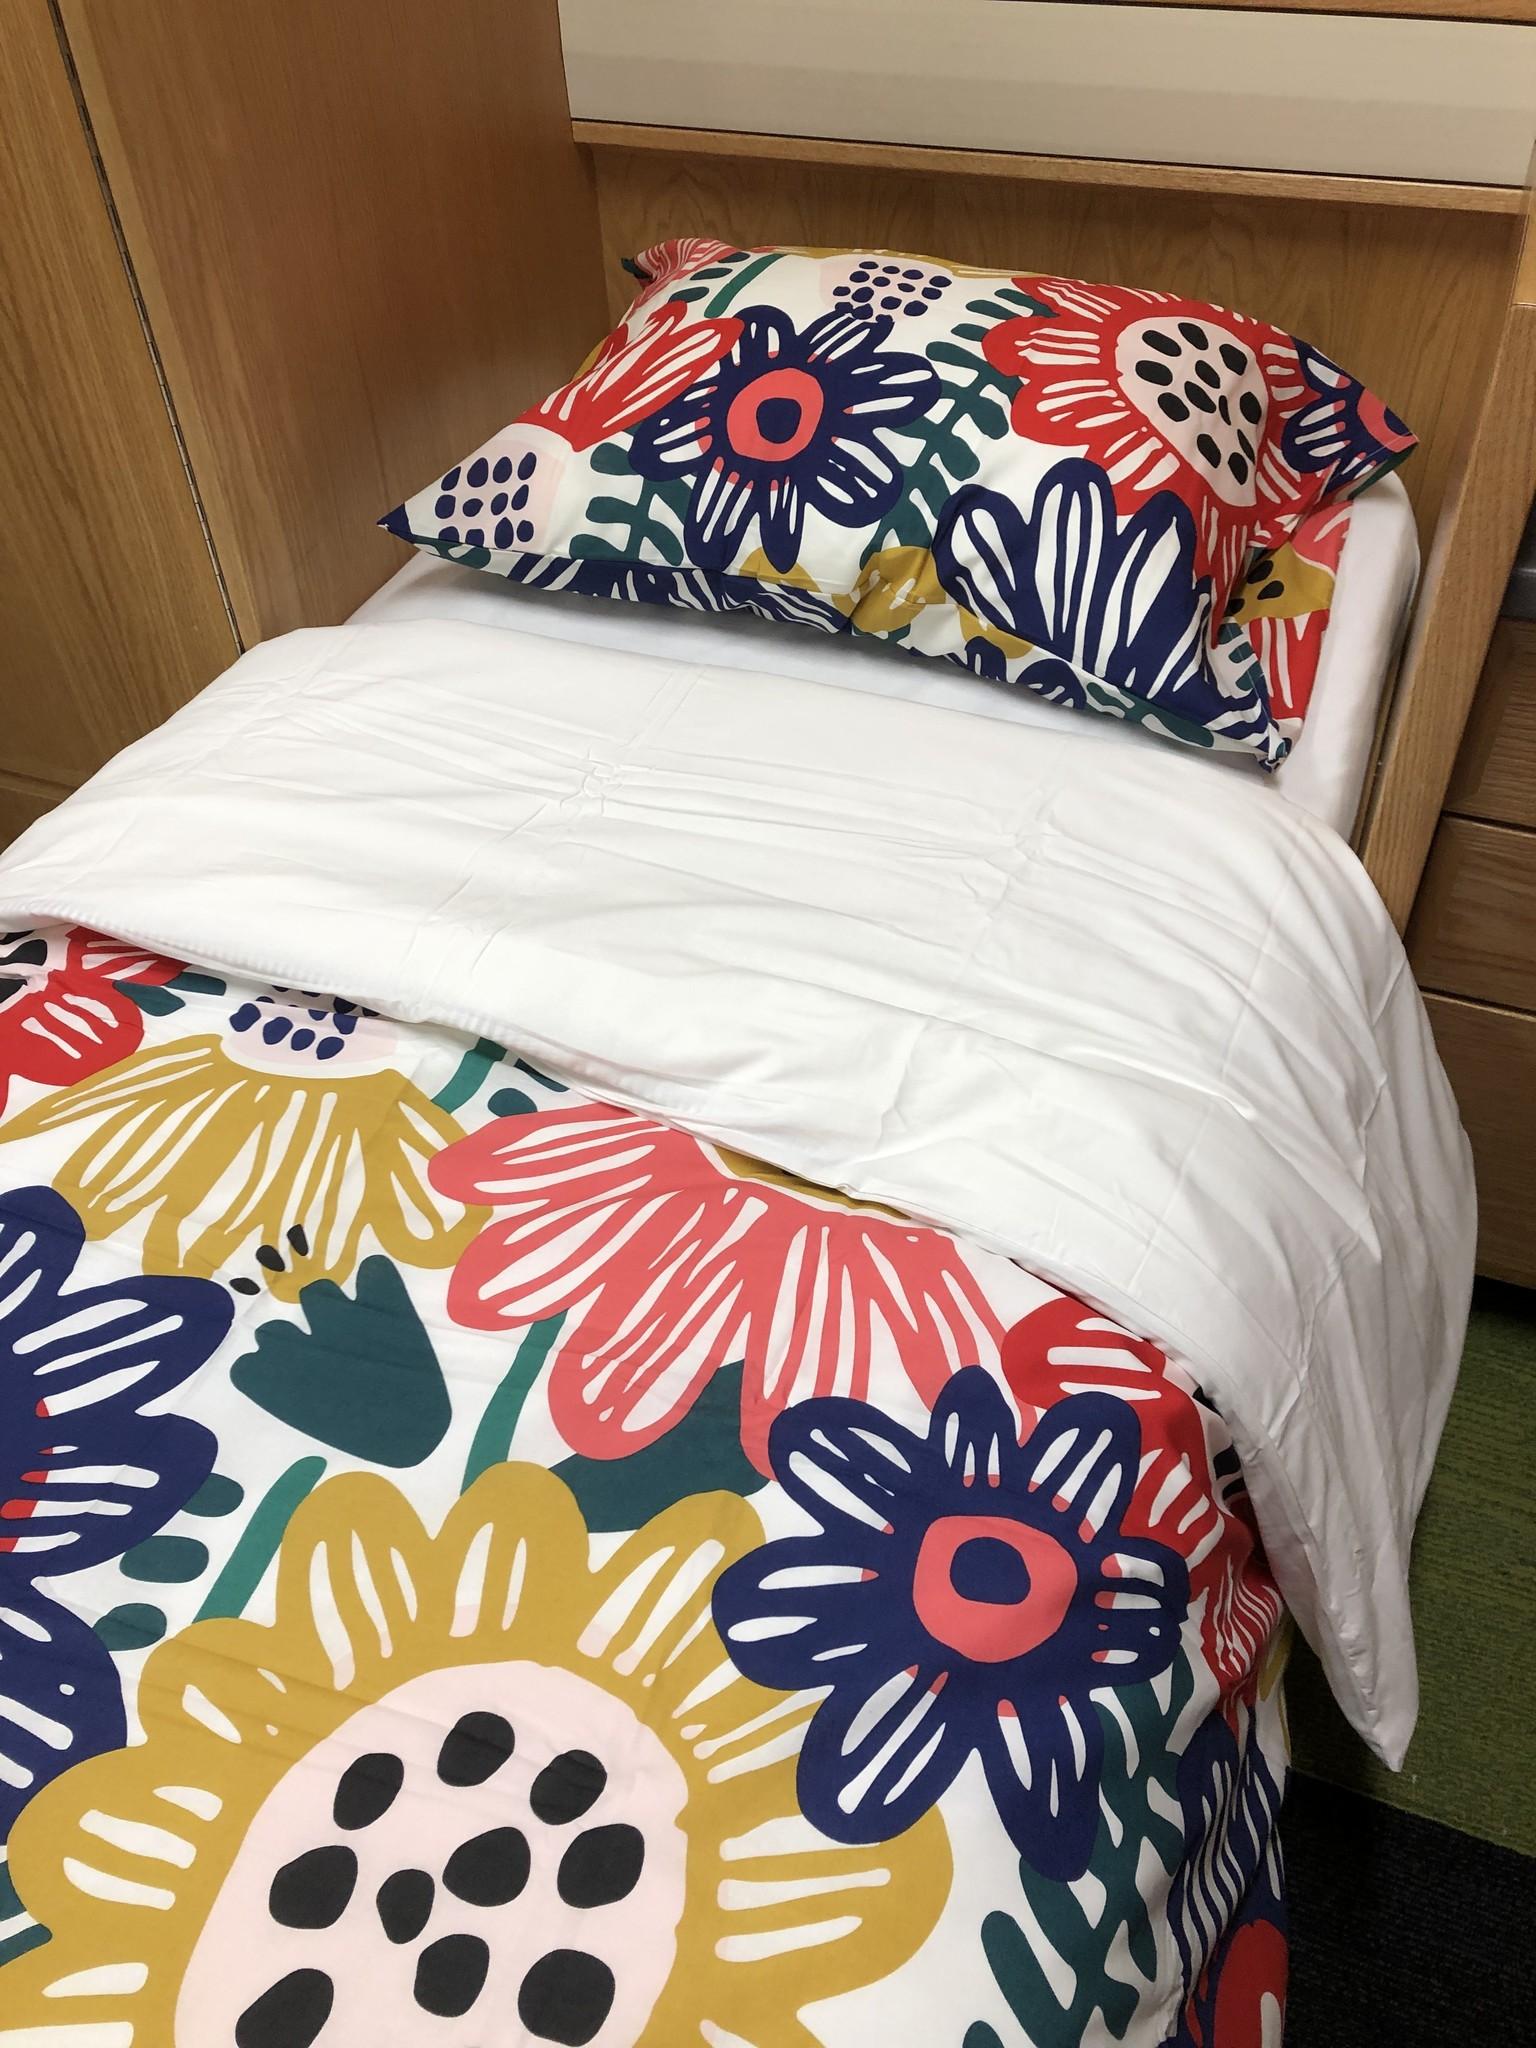 Dorm Package - 2 - Floral print